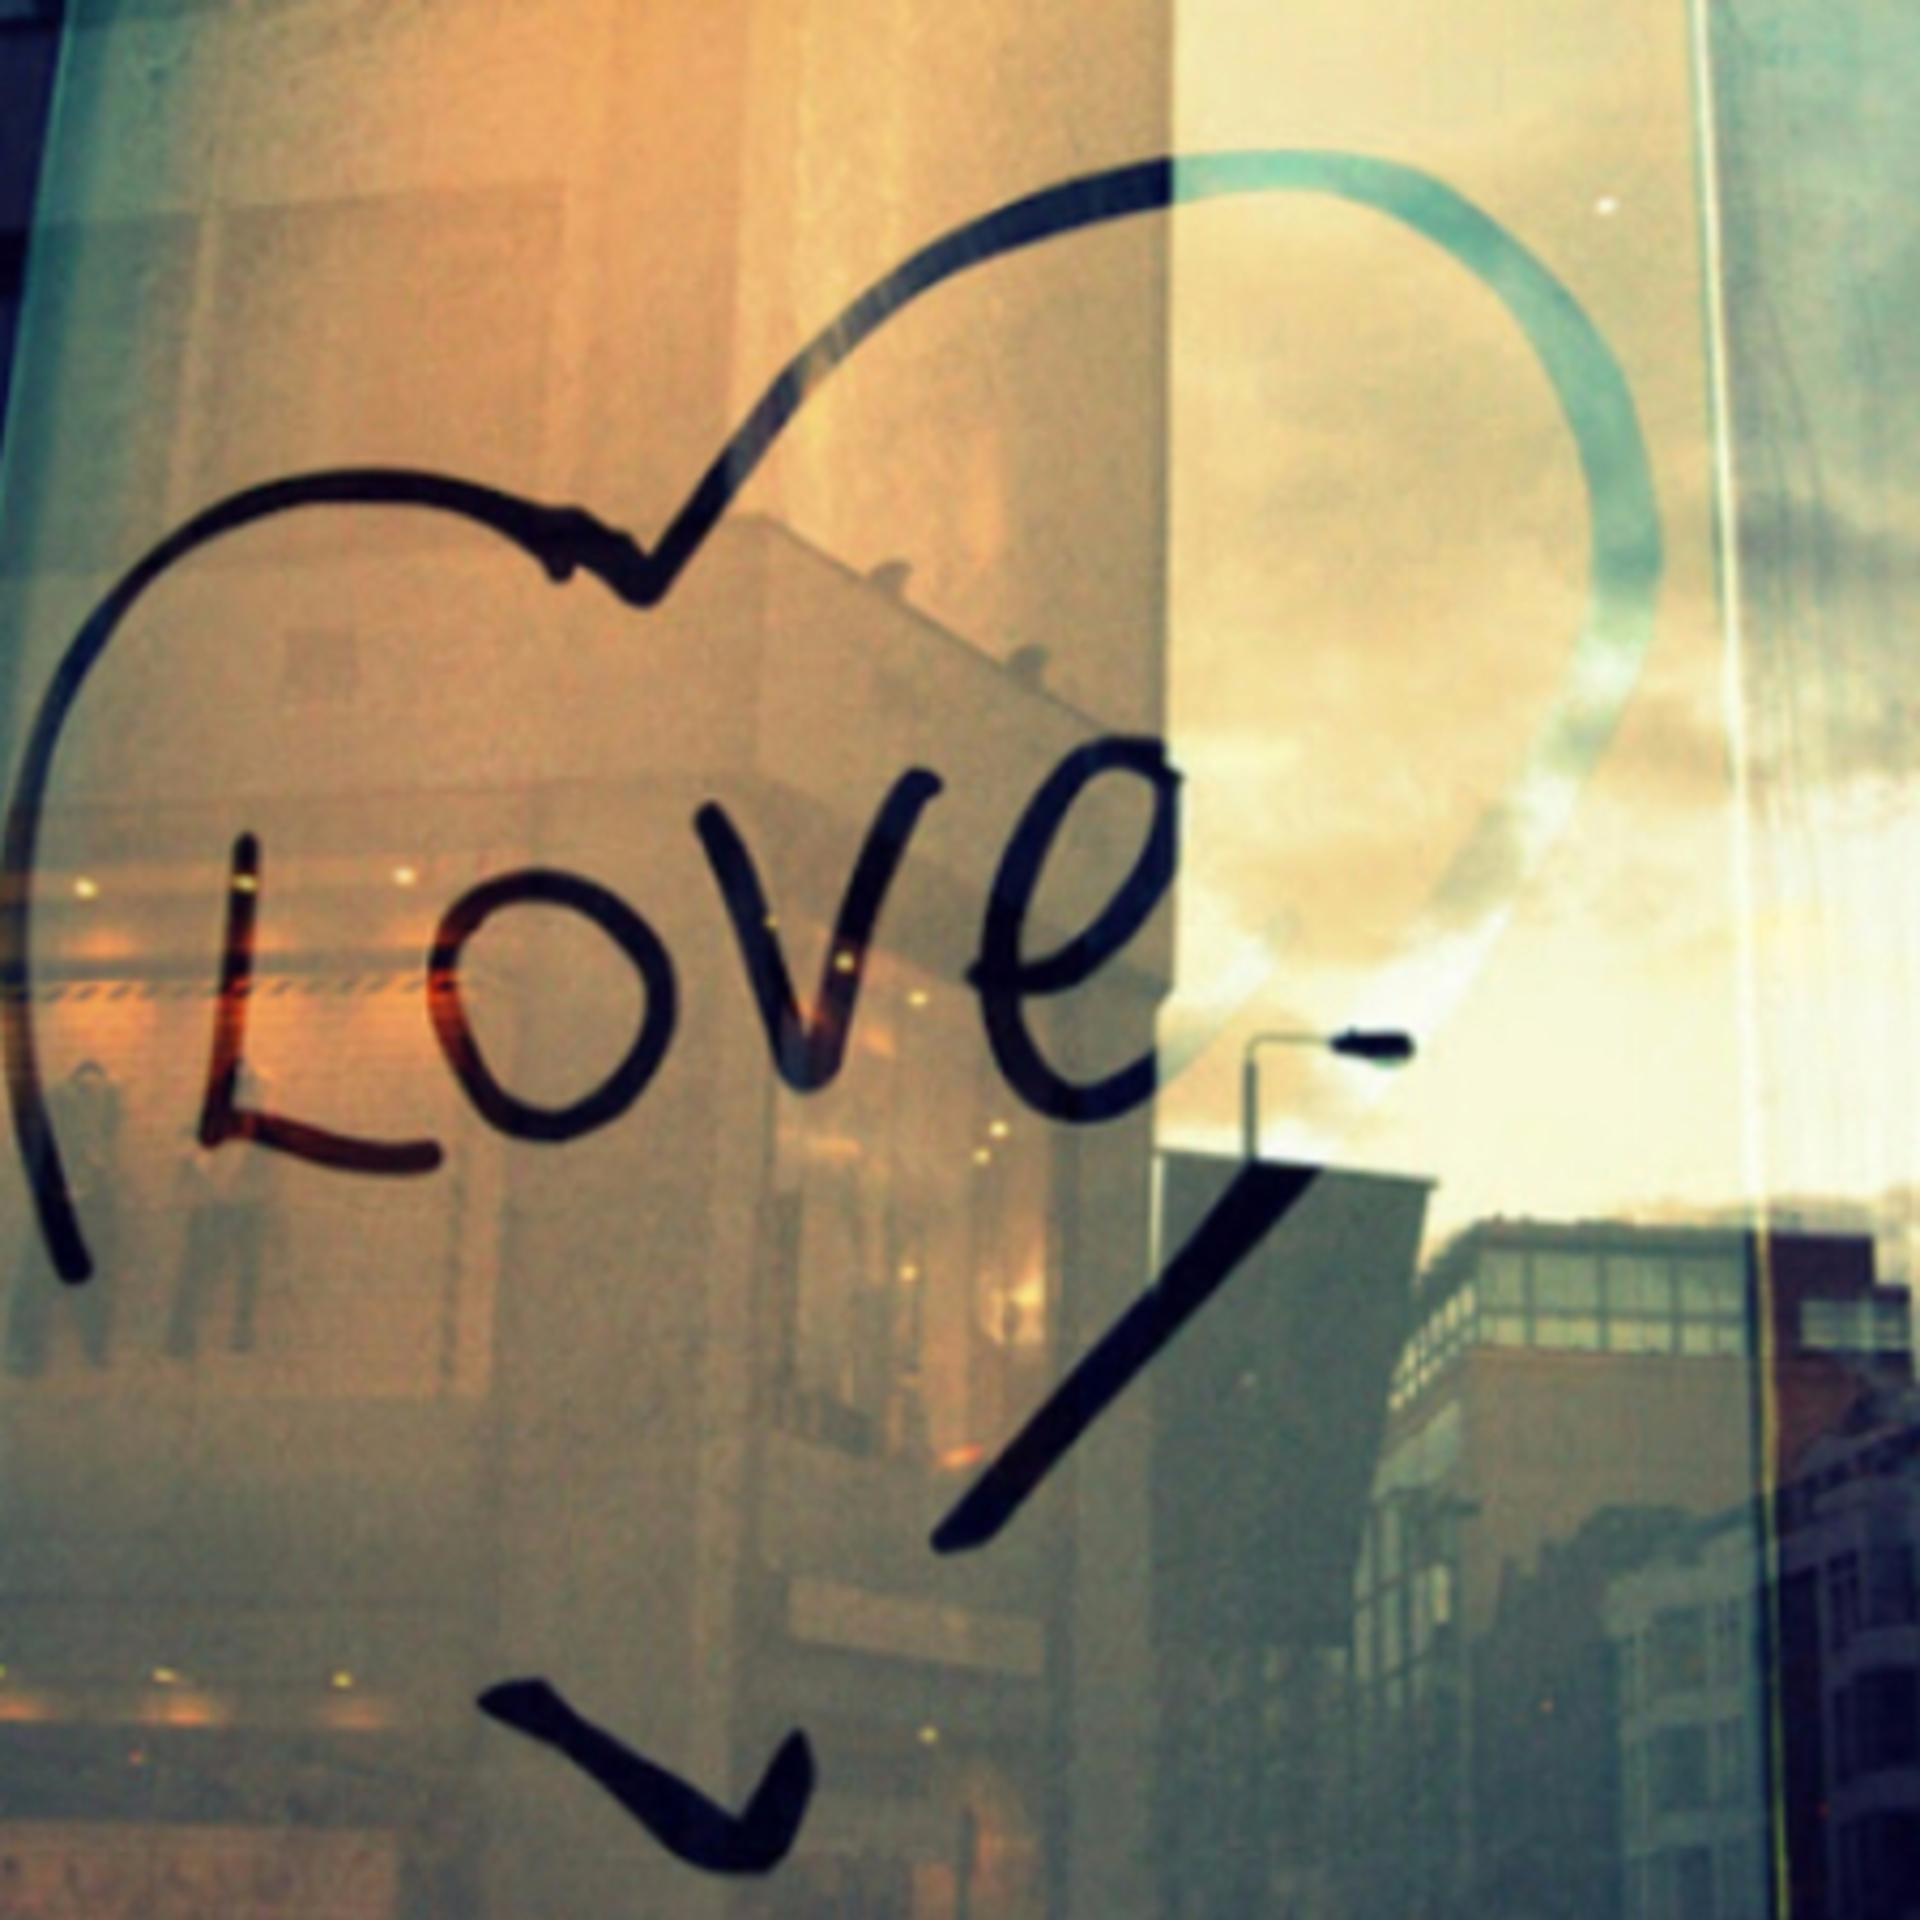 Love. image